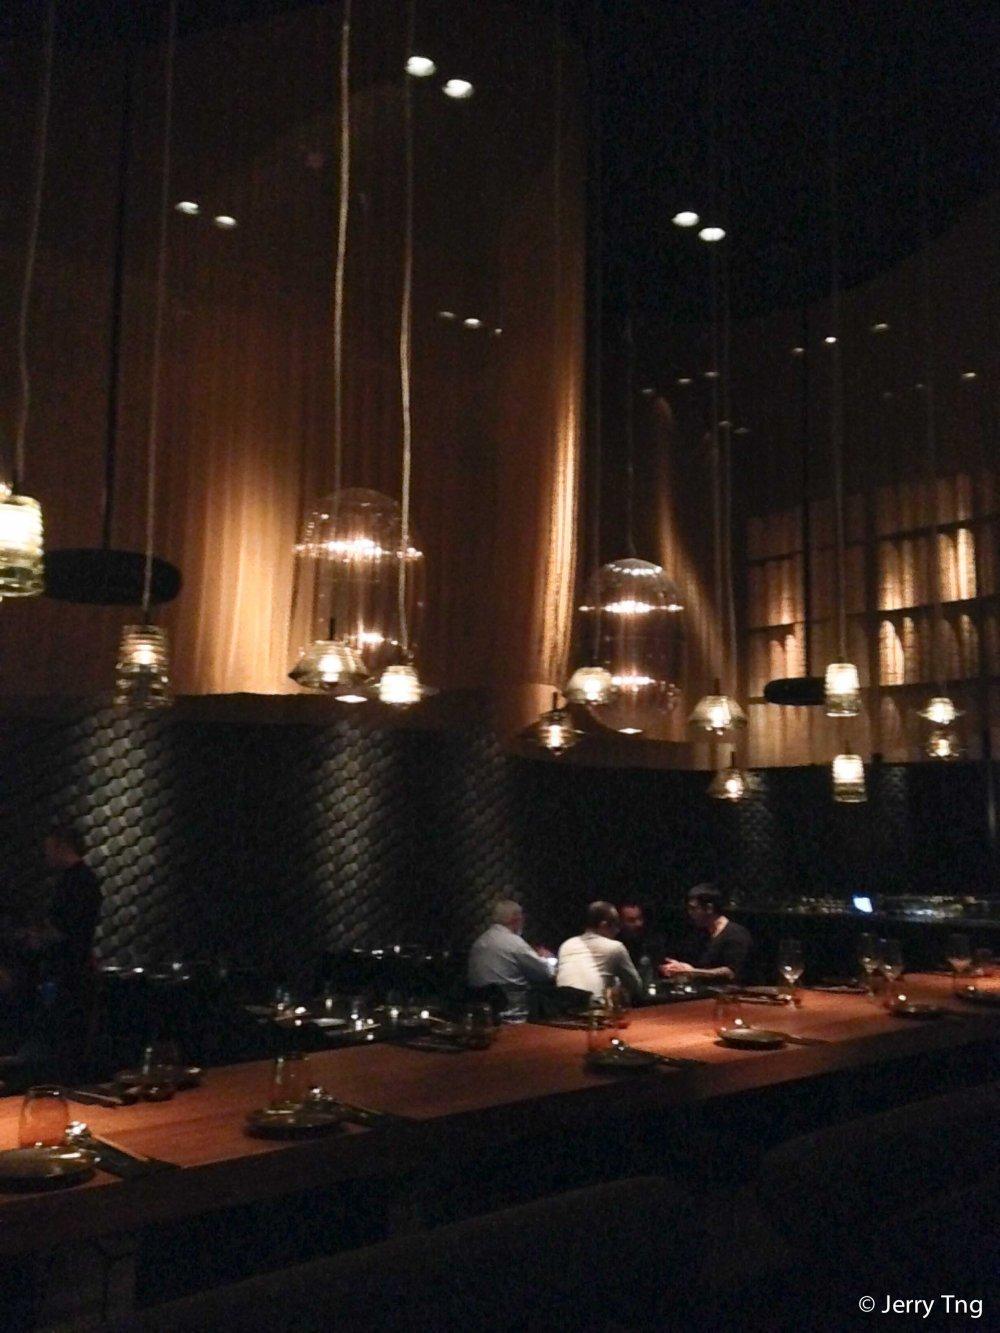 Lounge bar atmosphere